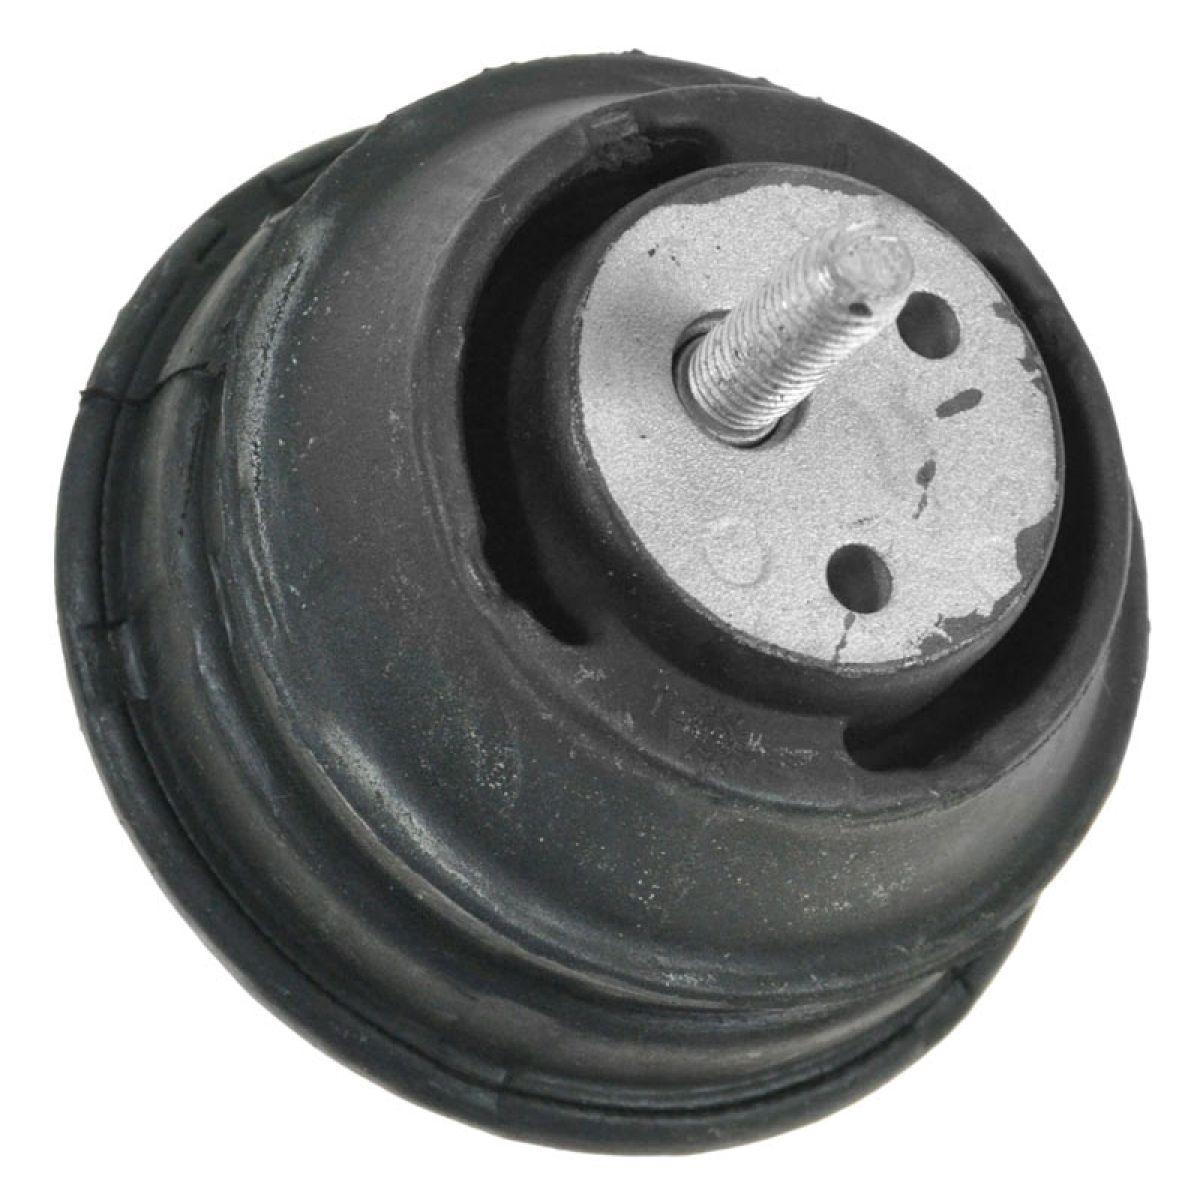 hight resolution of engine motor mount front for 97 03 bmw 525i 528i 530i e39